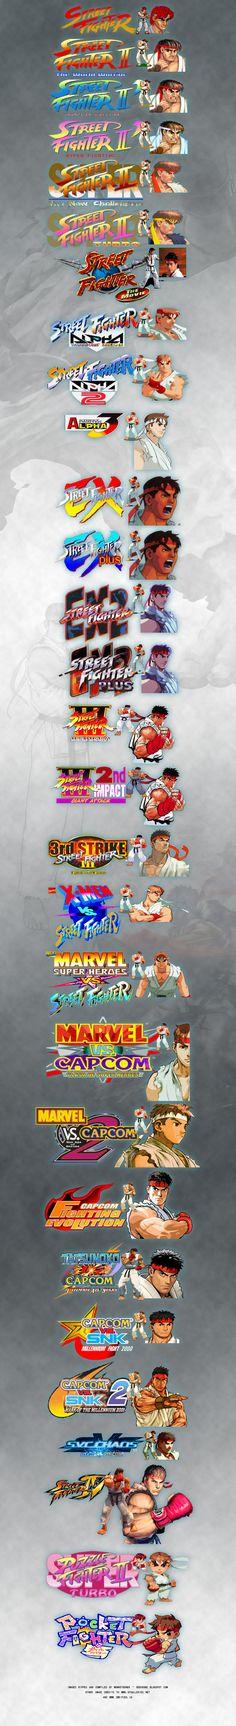 ryu_street_fighter-evolution-by-game.jpg (800×5852)